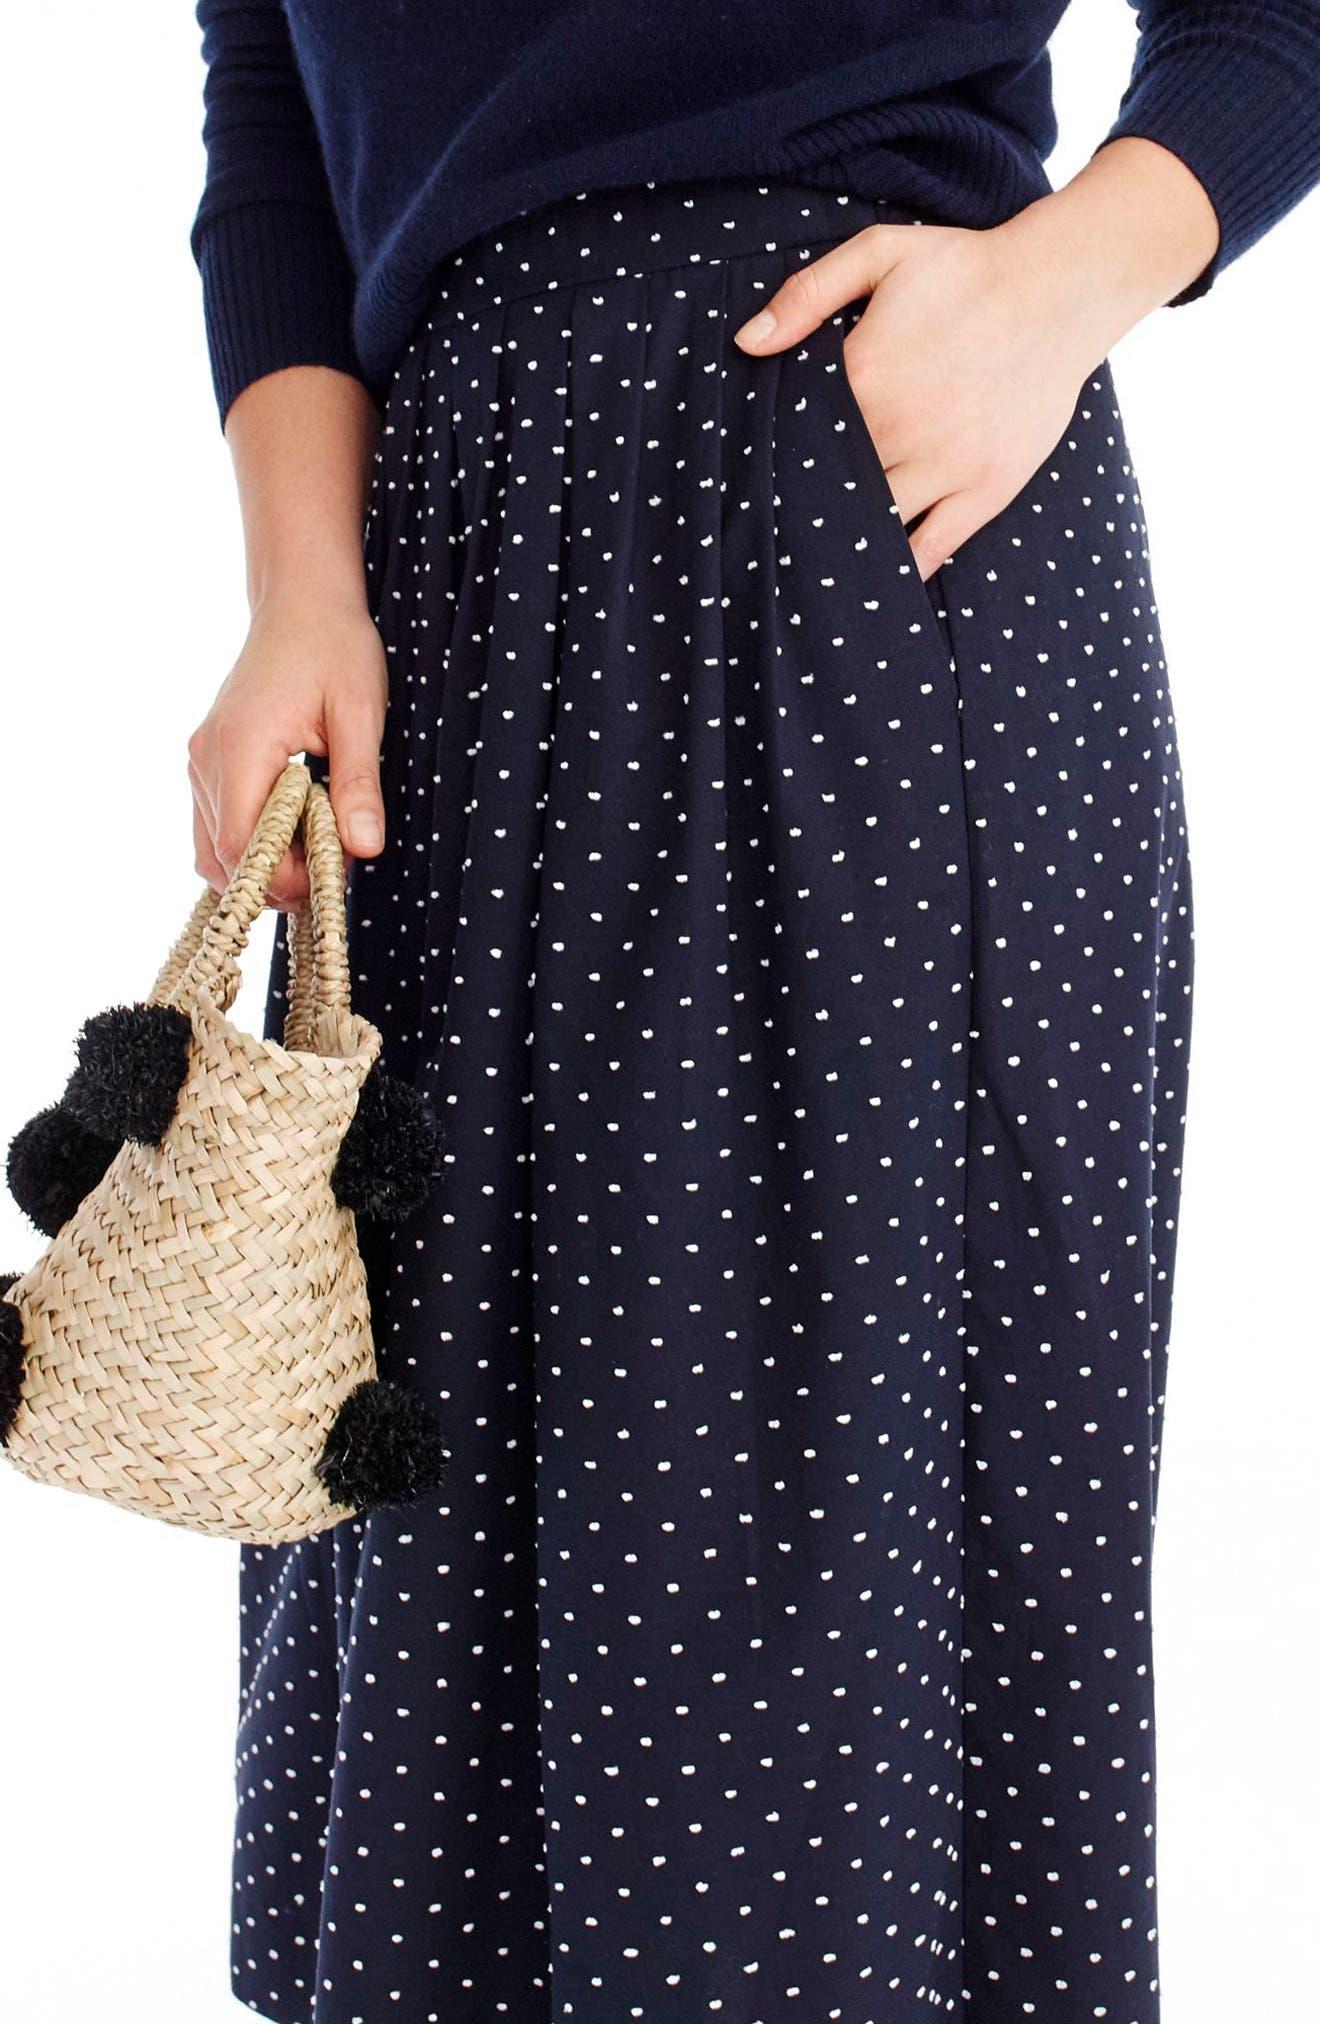 Vintage Clip Dot Midi Skirt,                             Alternate thumbnail 3, color,                             400